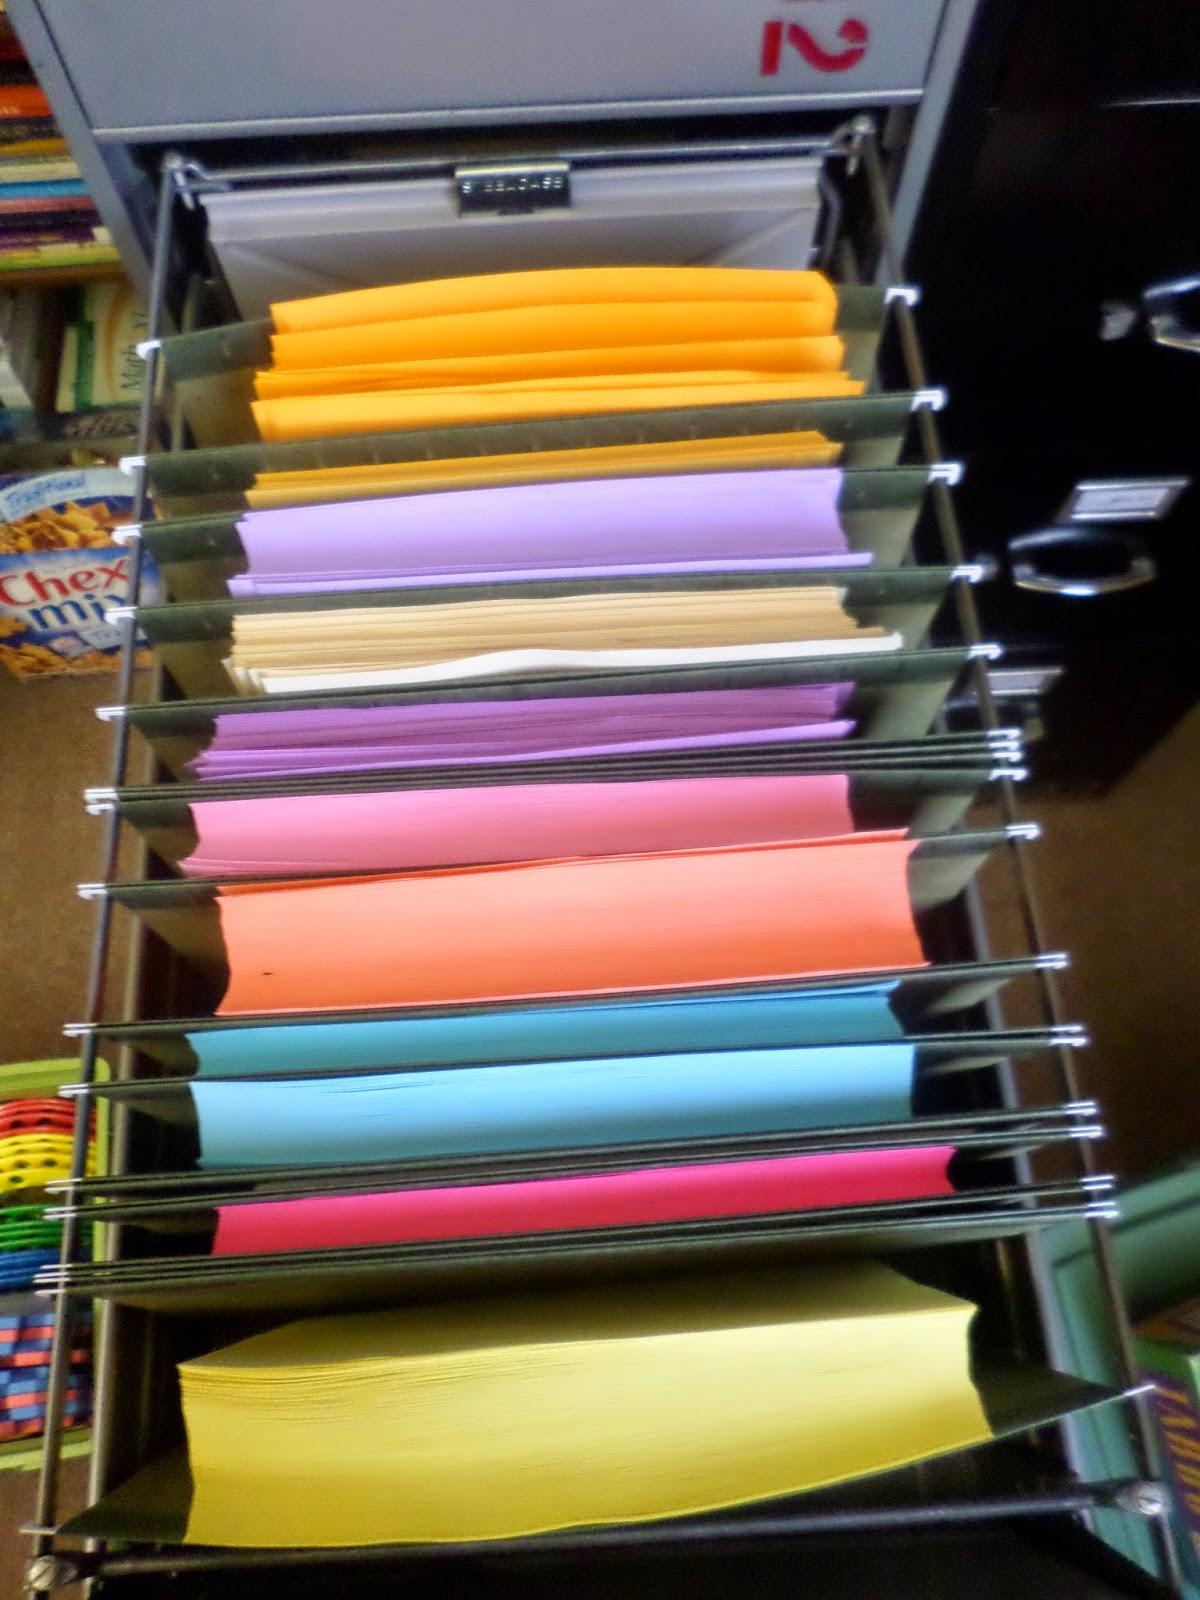 math u003d love organizing my colored paper obsession